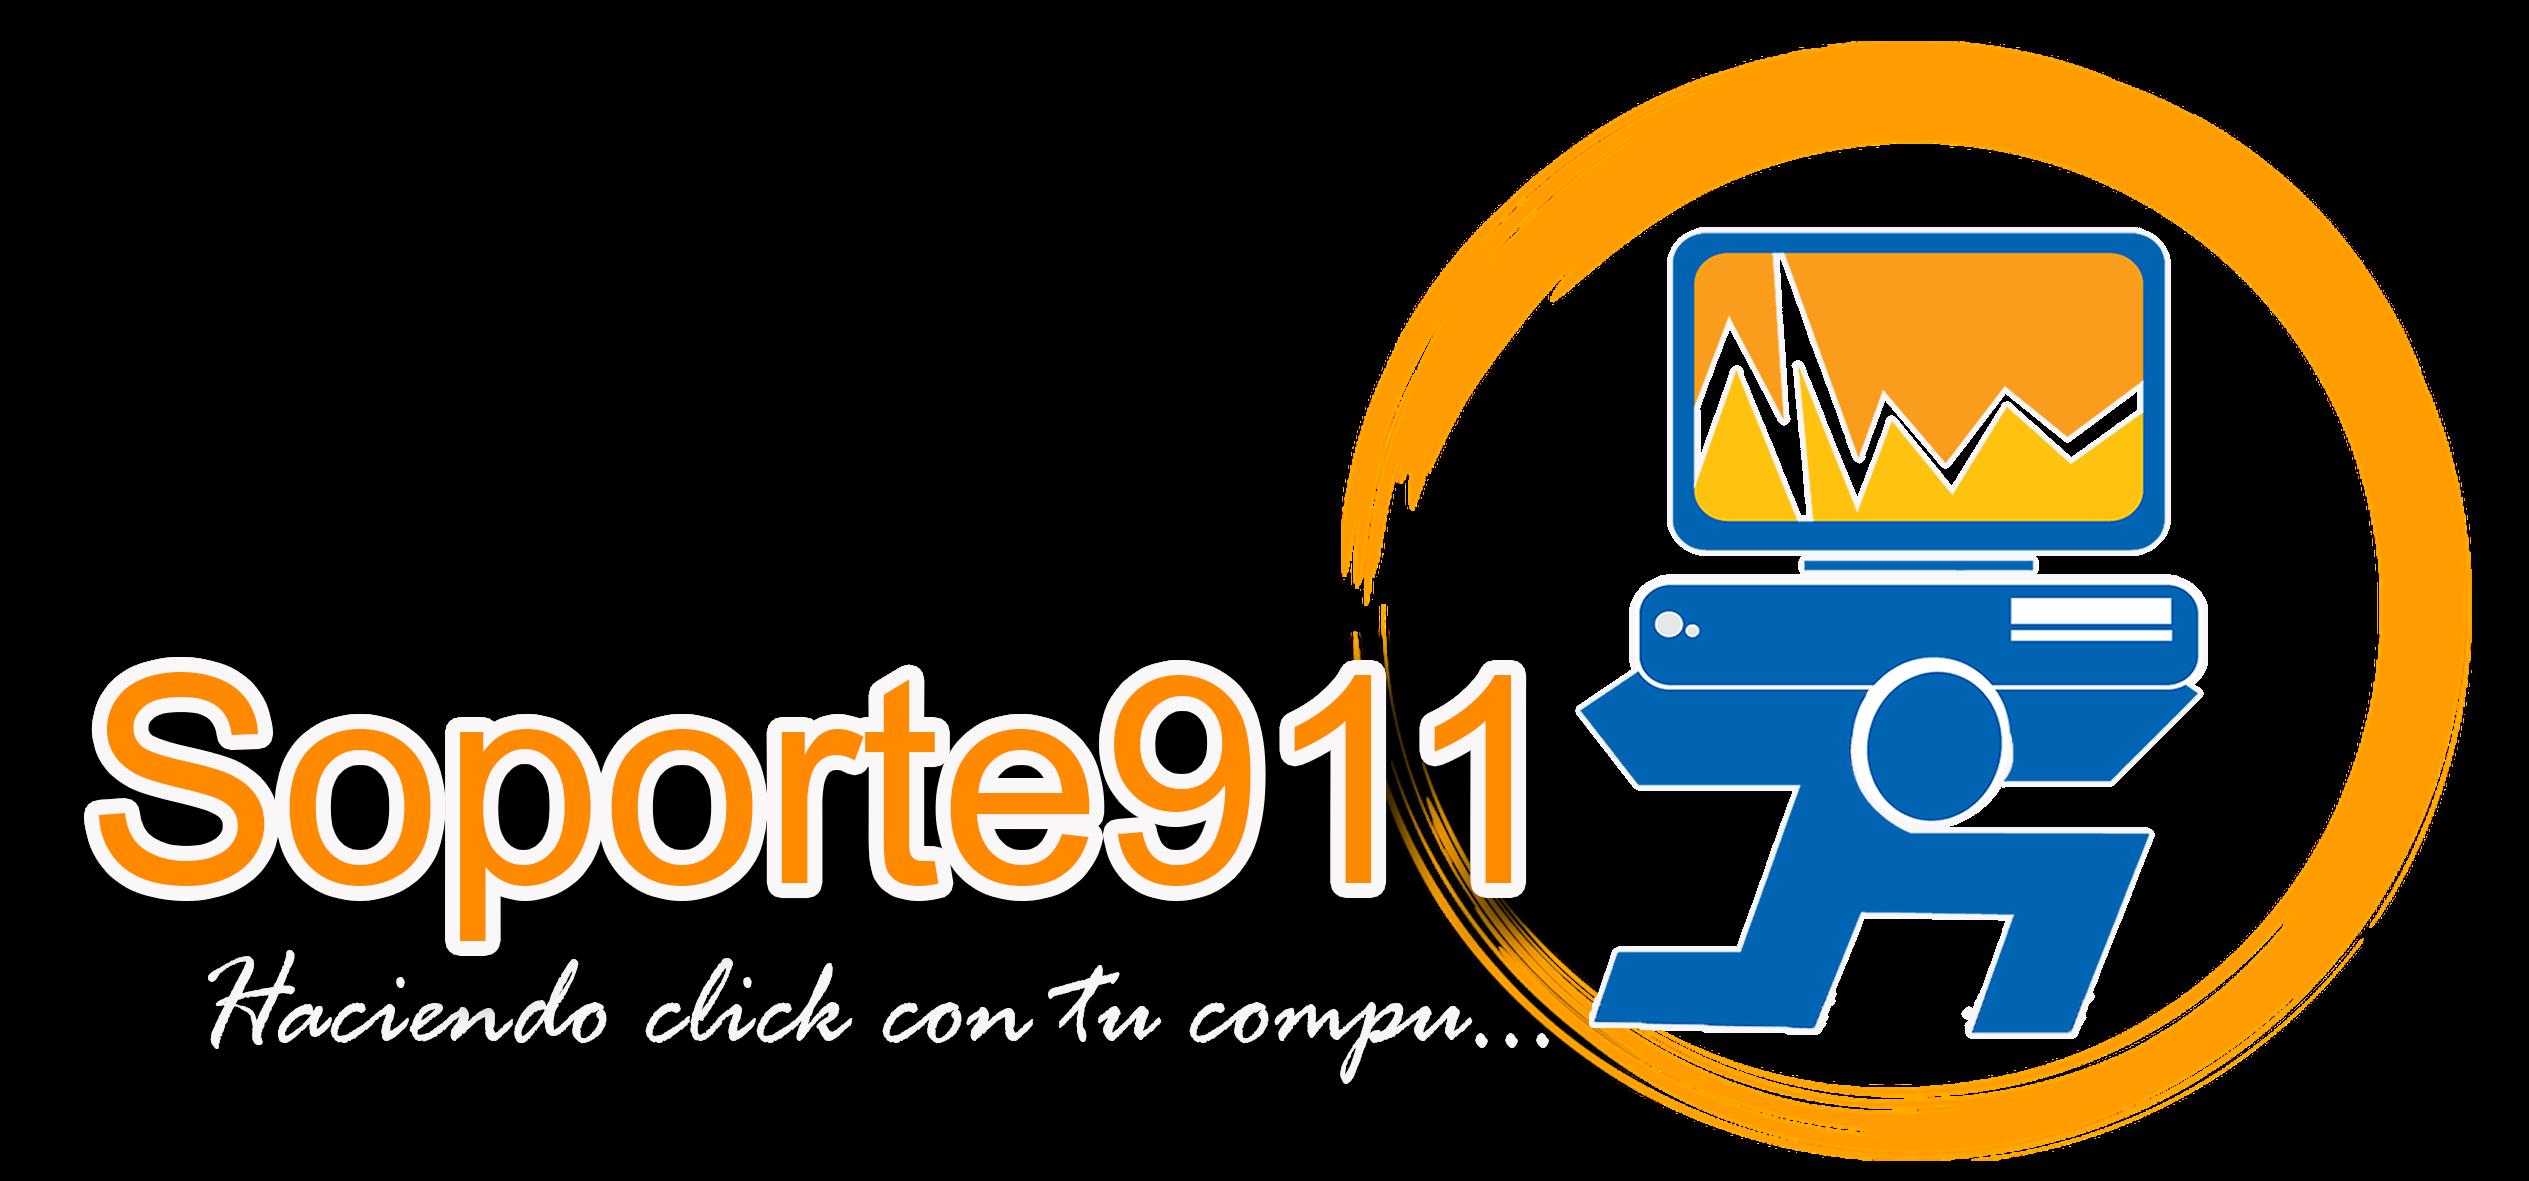 Soporte911